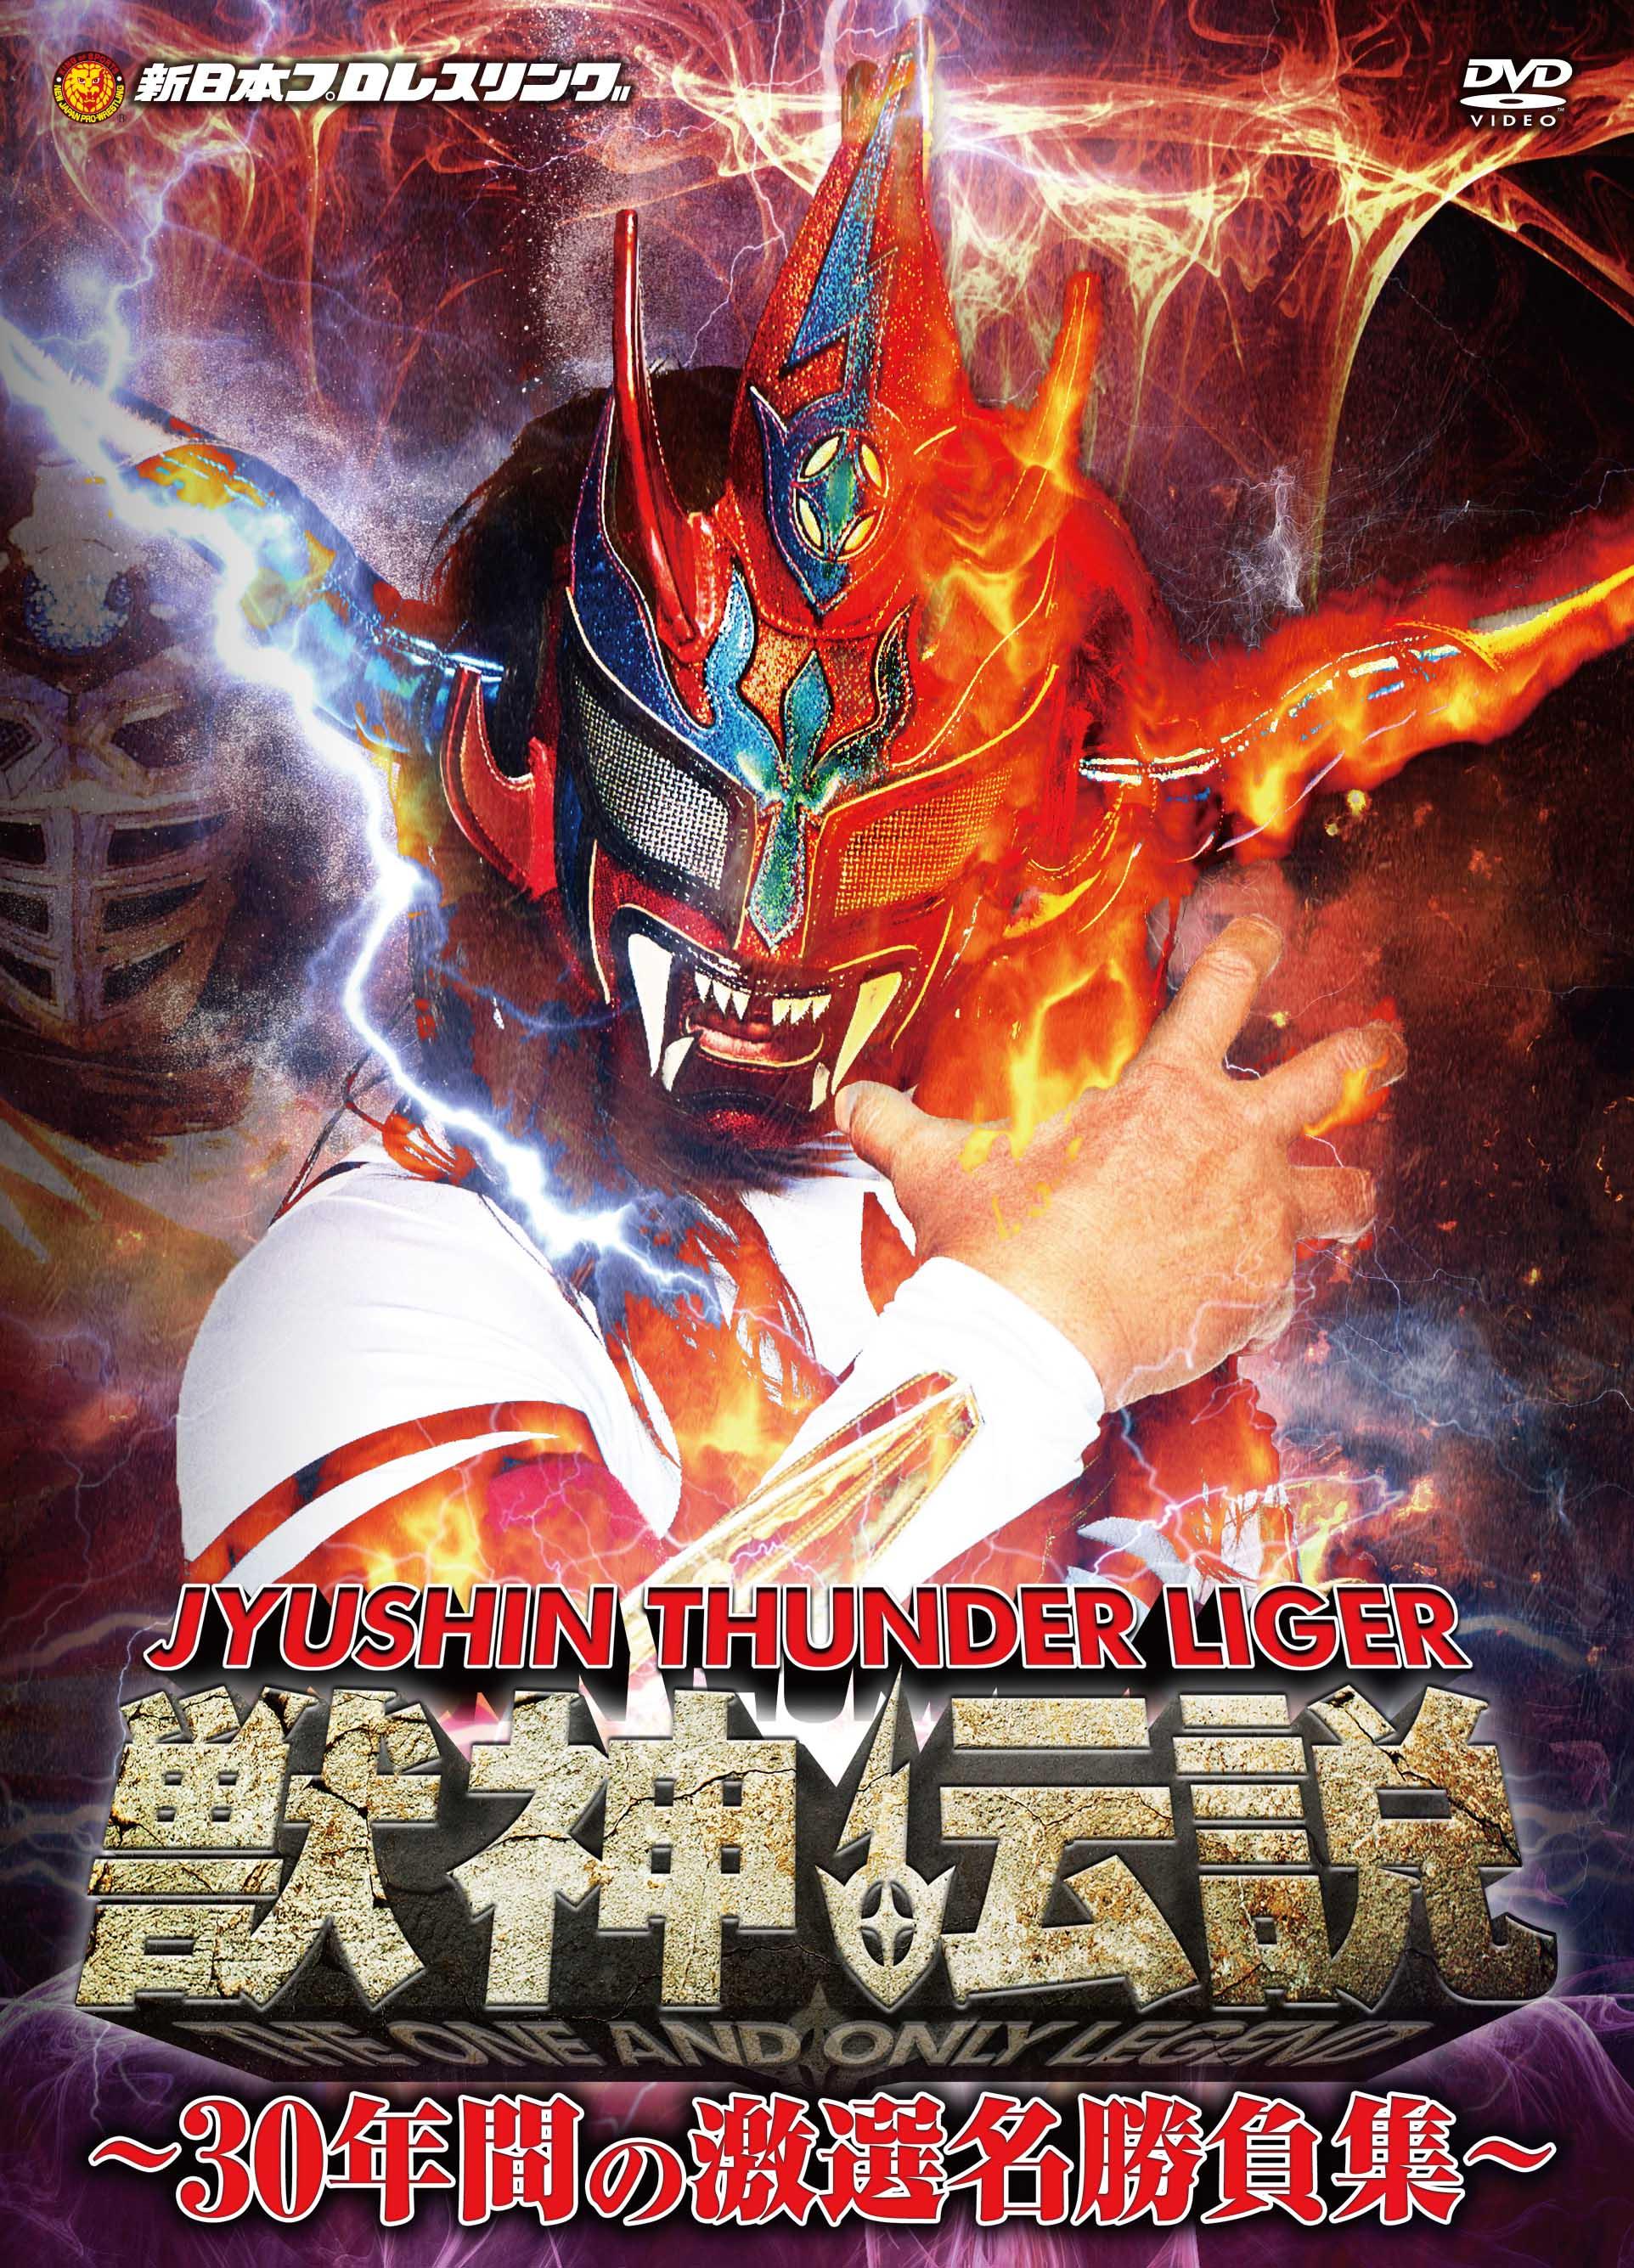 獣神サンダー・ライガー引退記念DVD Vol.1 獣神伝説~30年間の激選名勝負集~DVD-BOX 【初回生産限定1000BOX】